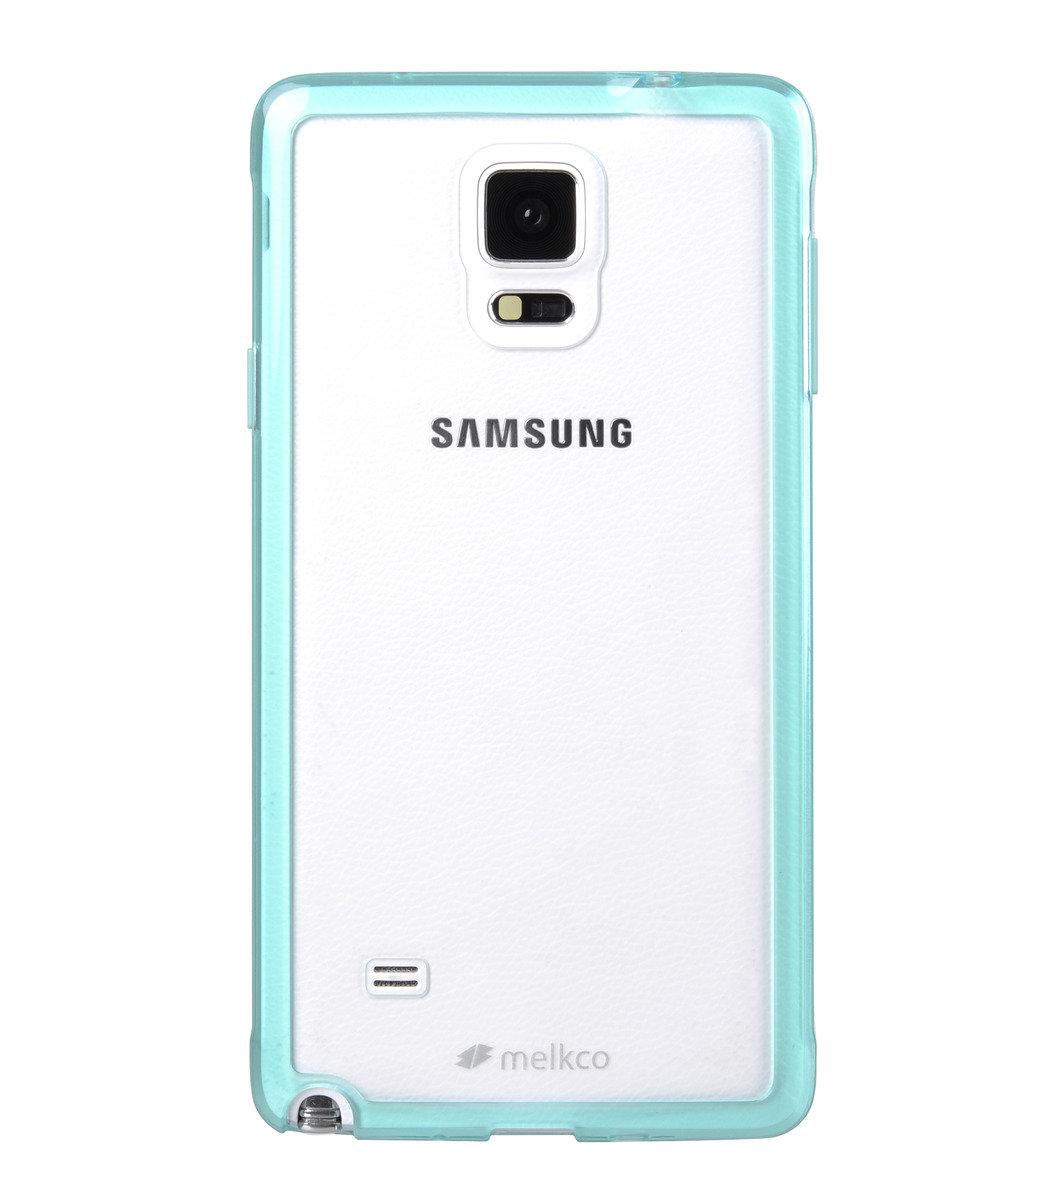 Galaxy Note 4 PolyUltima 手機保護殼 - 透明綠色(附送屏幕保護貼)